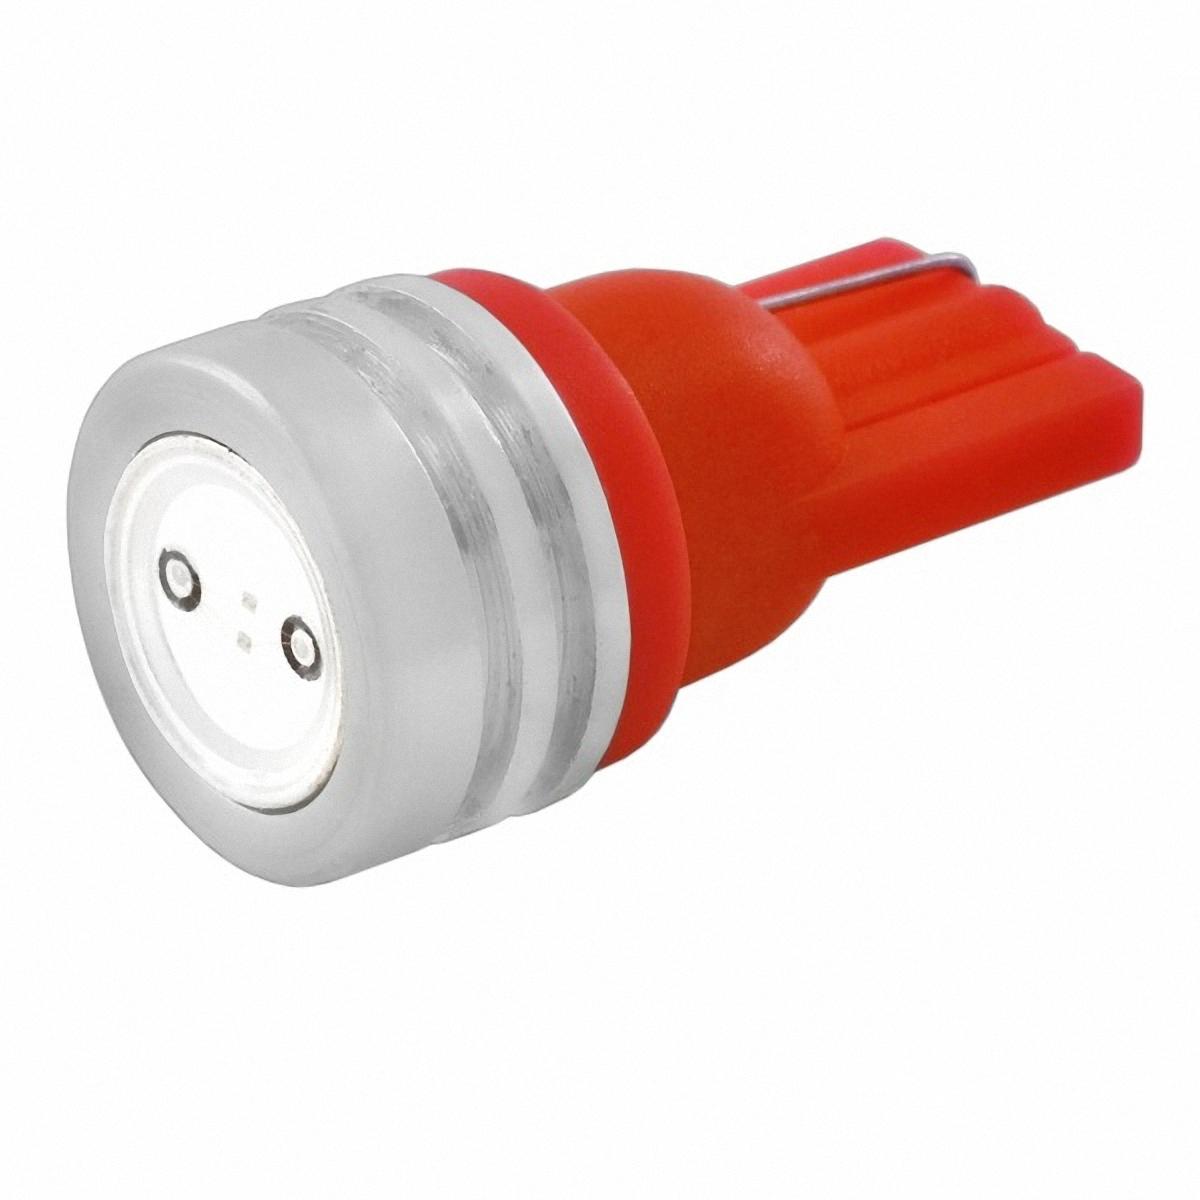 Skyway Автолампа диод T10 (W5W). ST10HP-1RST10HP-1R1 SMD диод EXTRA LIGHT без цоколя радиатор 1-контактная Красная